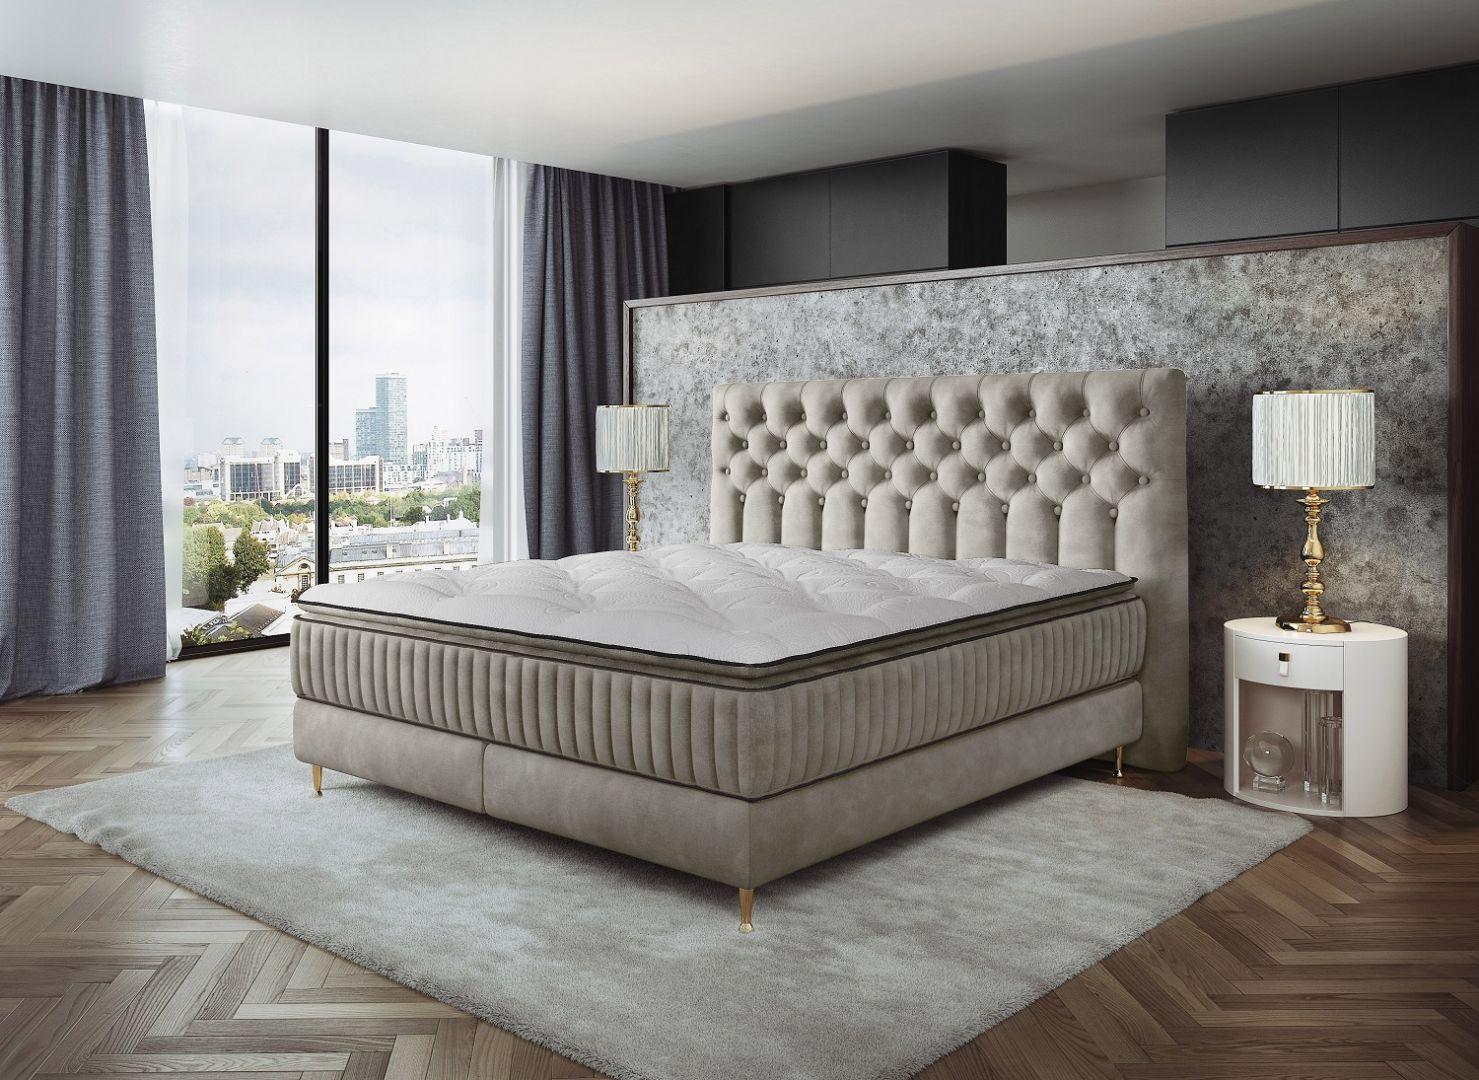 Łóżko kontynentalne Astoria marki Comforteo. Fot. Comforteo